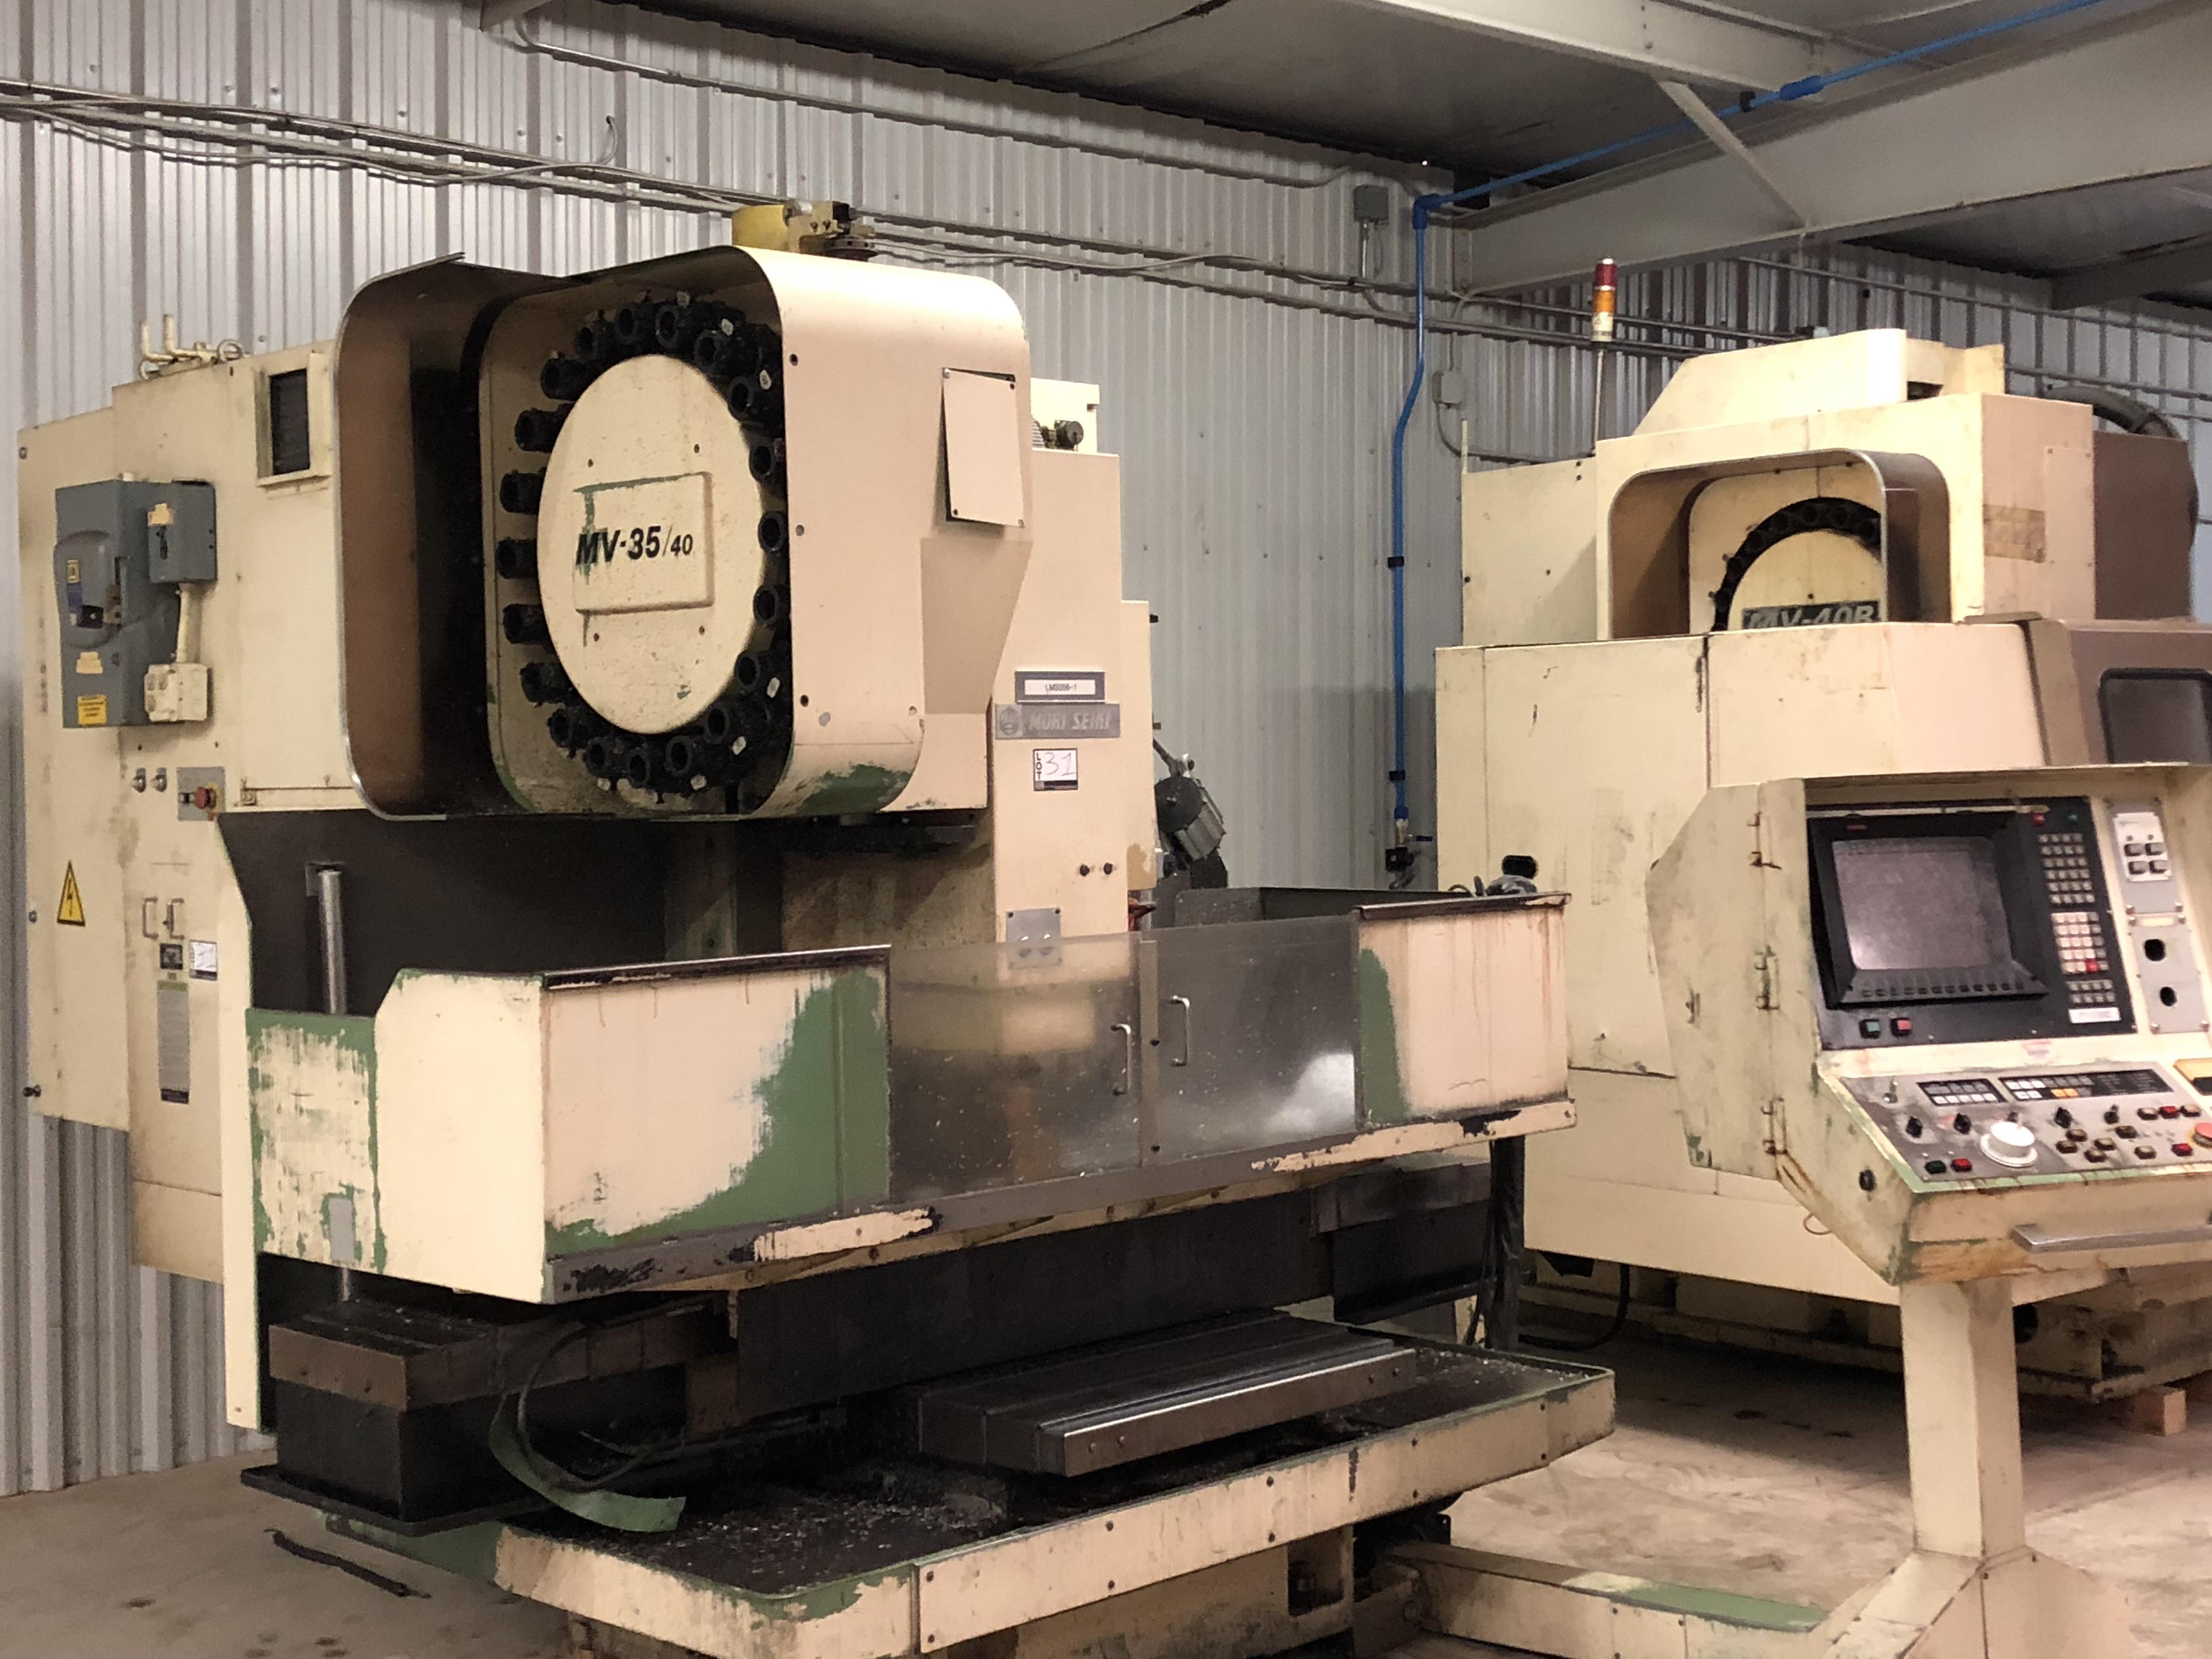 "Mori Seiki MV 35/40 CNC Mill, Fanuc 11M control w/ LCD screen CAT 40 spindle, 20 POS ATC, 30""x X - Image 2 of 6"